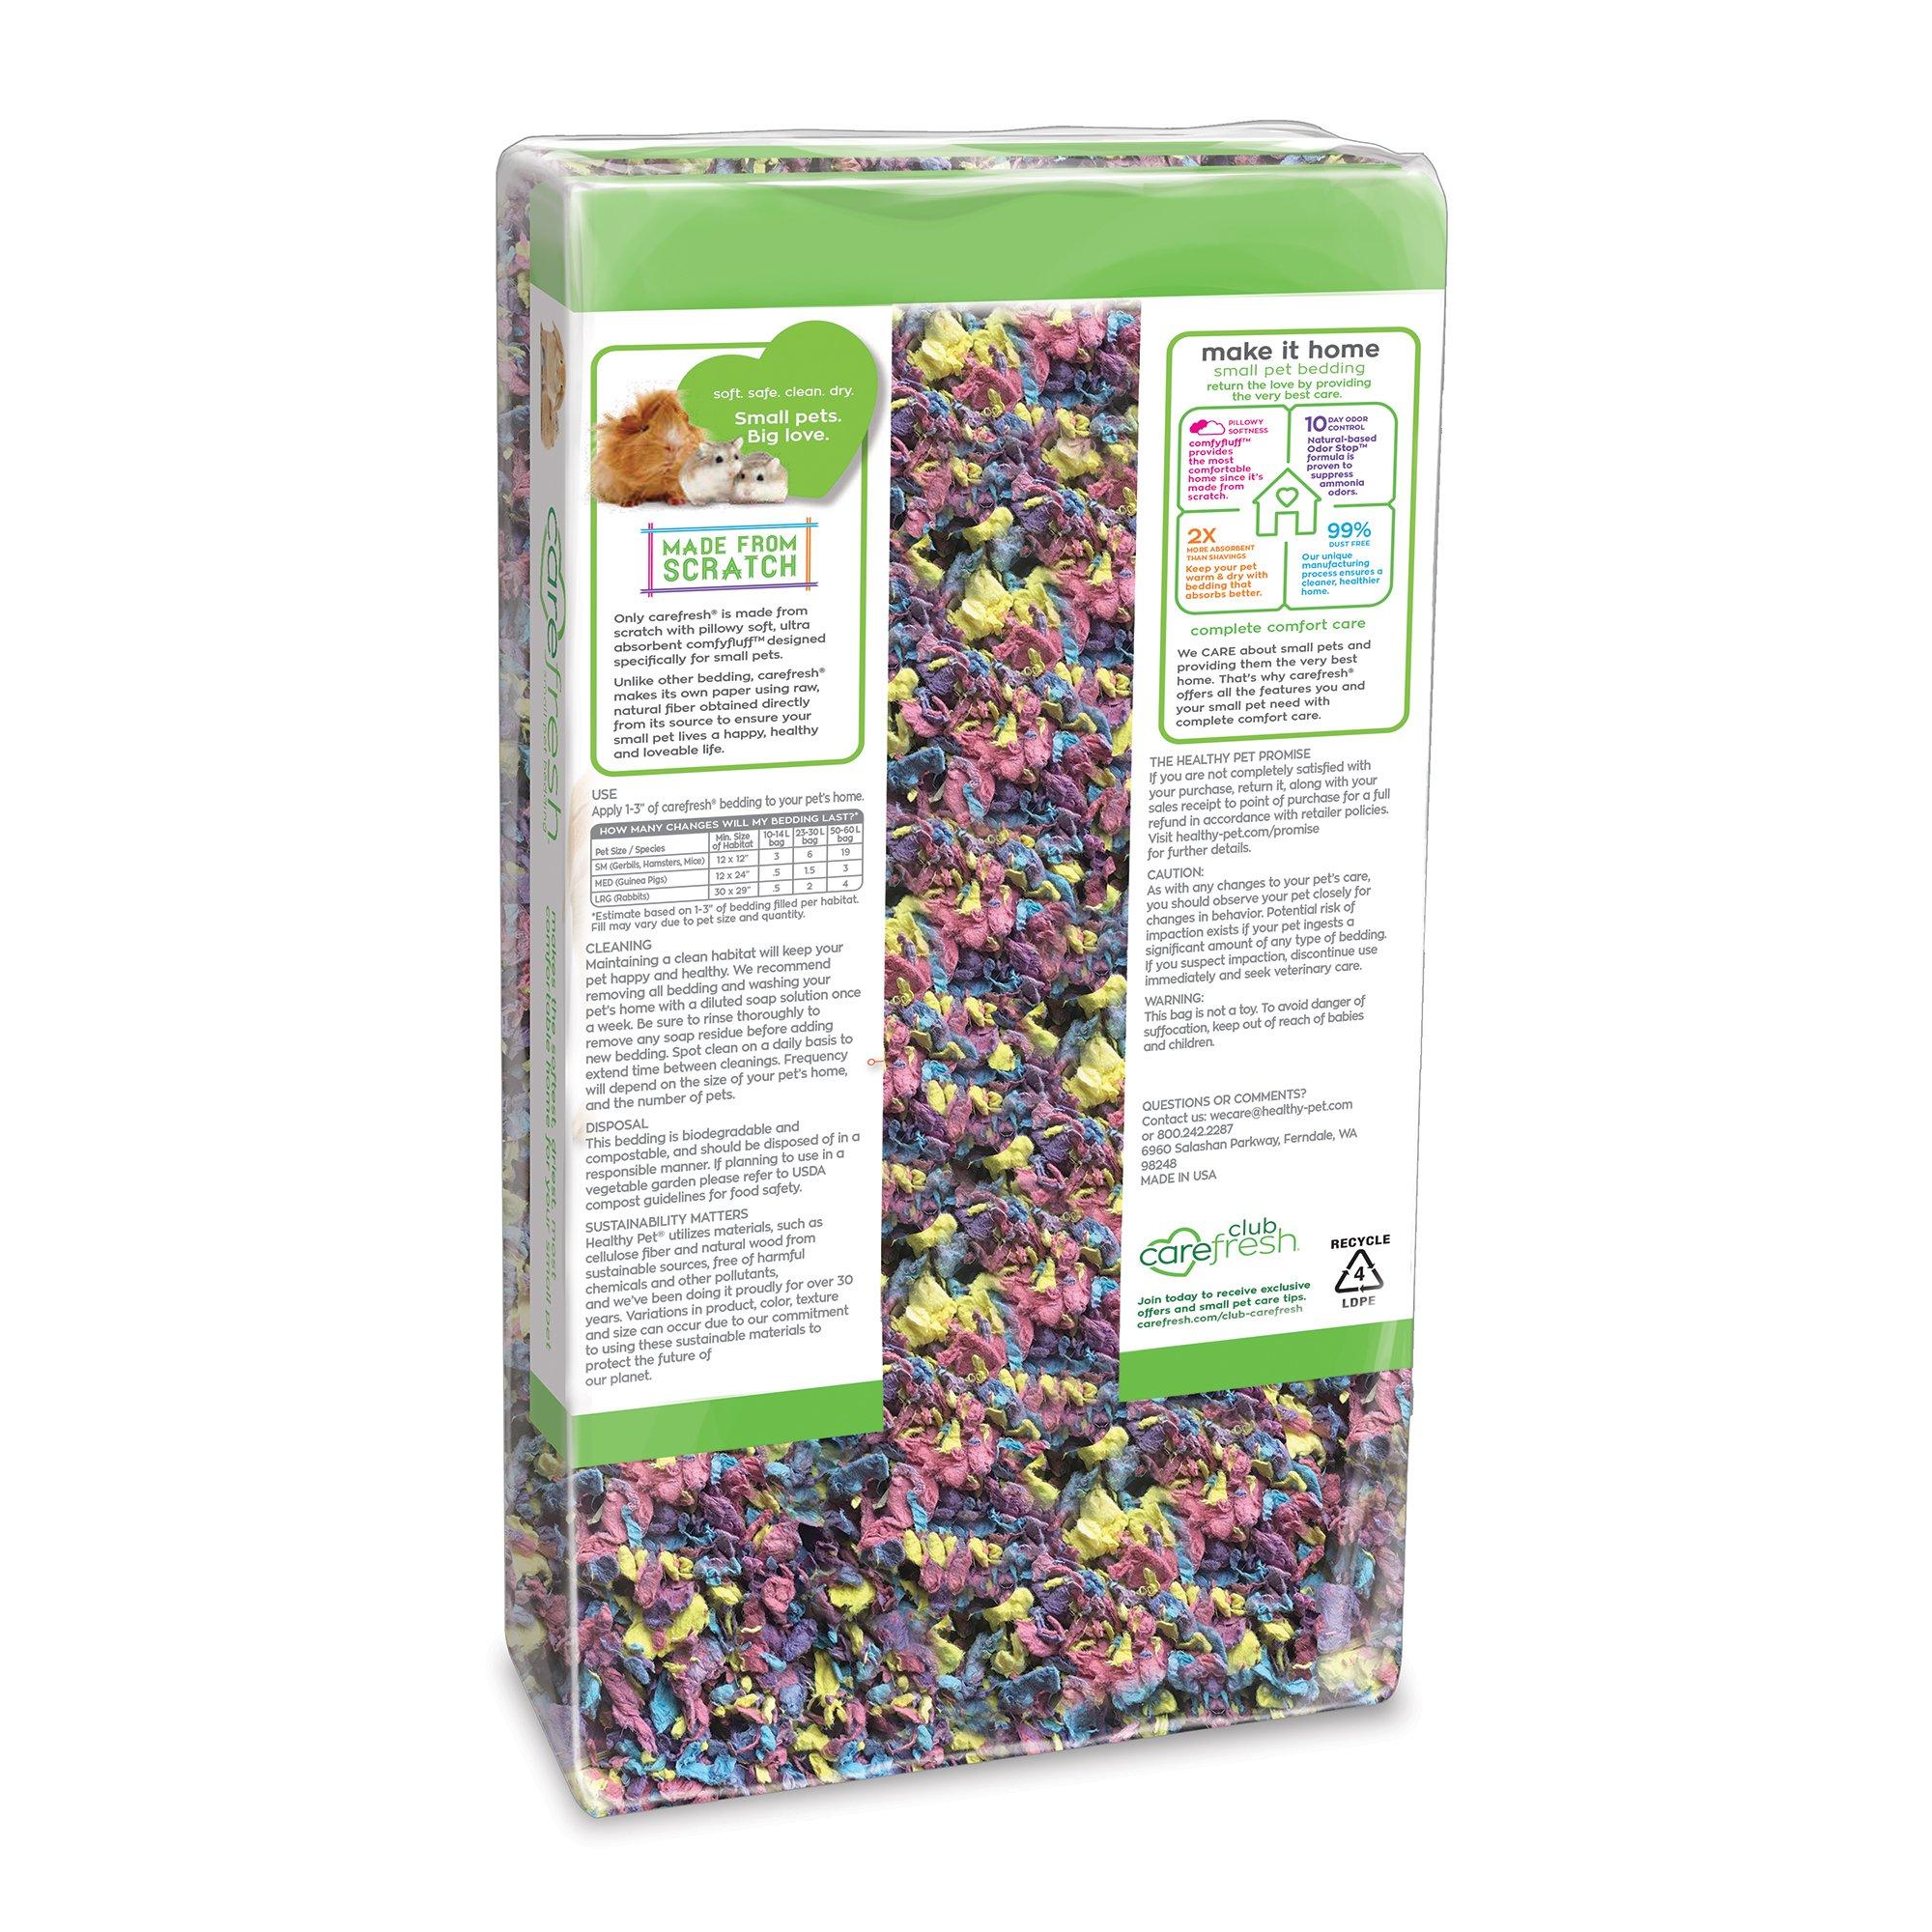 Carefresh Confetti Small Pet Bedding, 10 Liter, 10liter